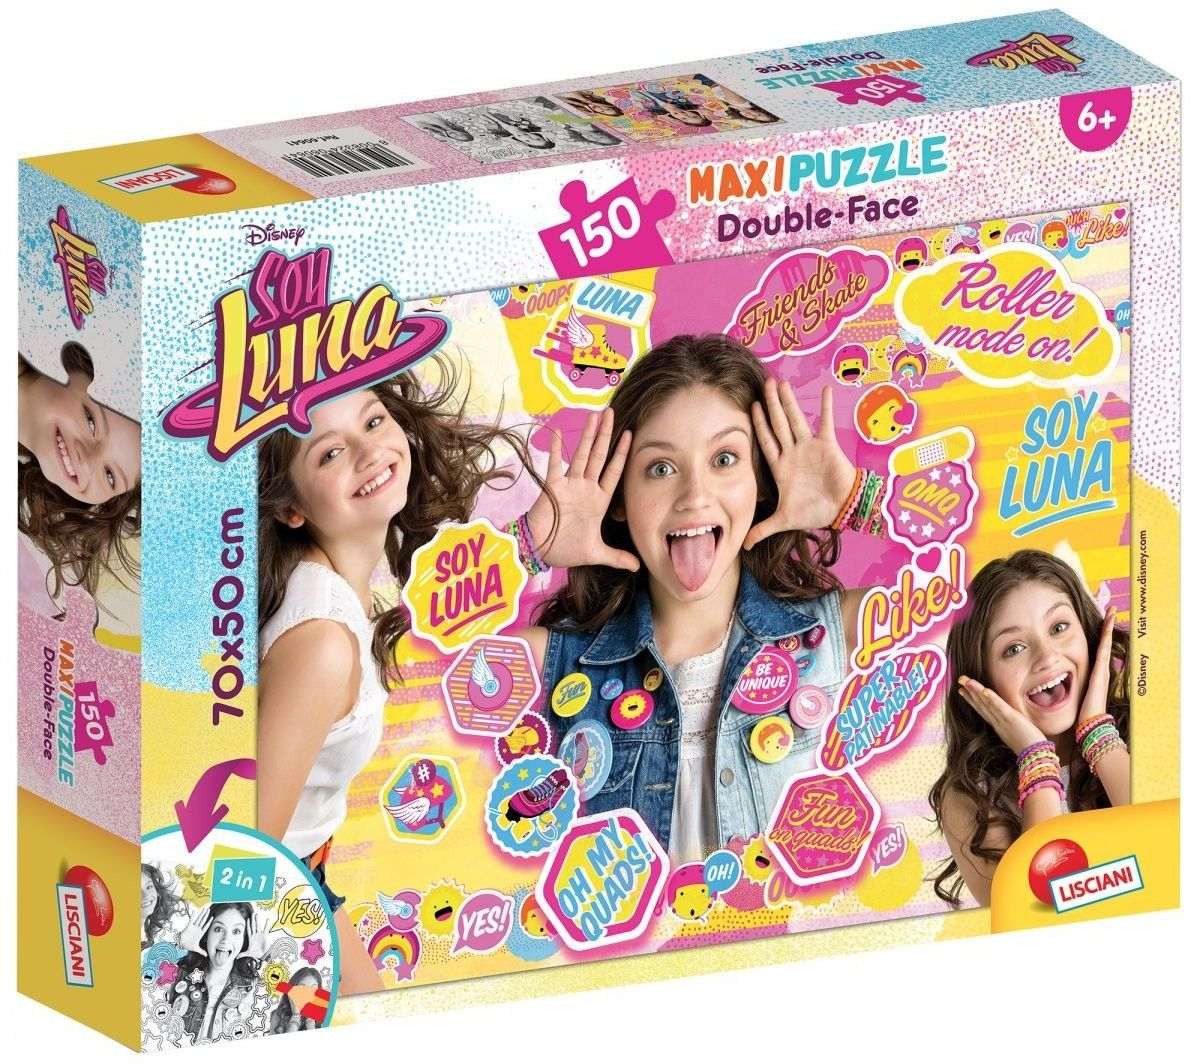 Lisciani spiele 60641  Puzzle DF Supermaxi 150 Soy Luna Roller Mode On